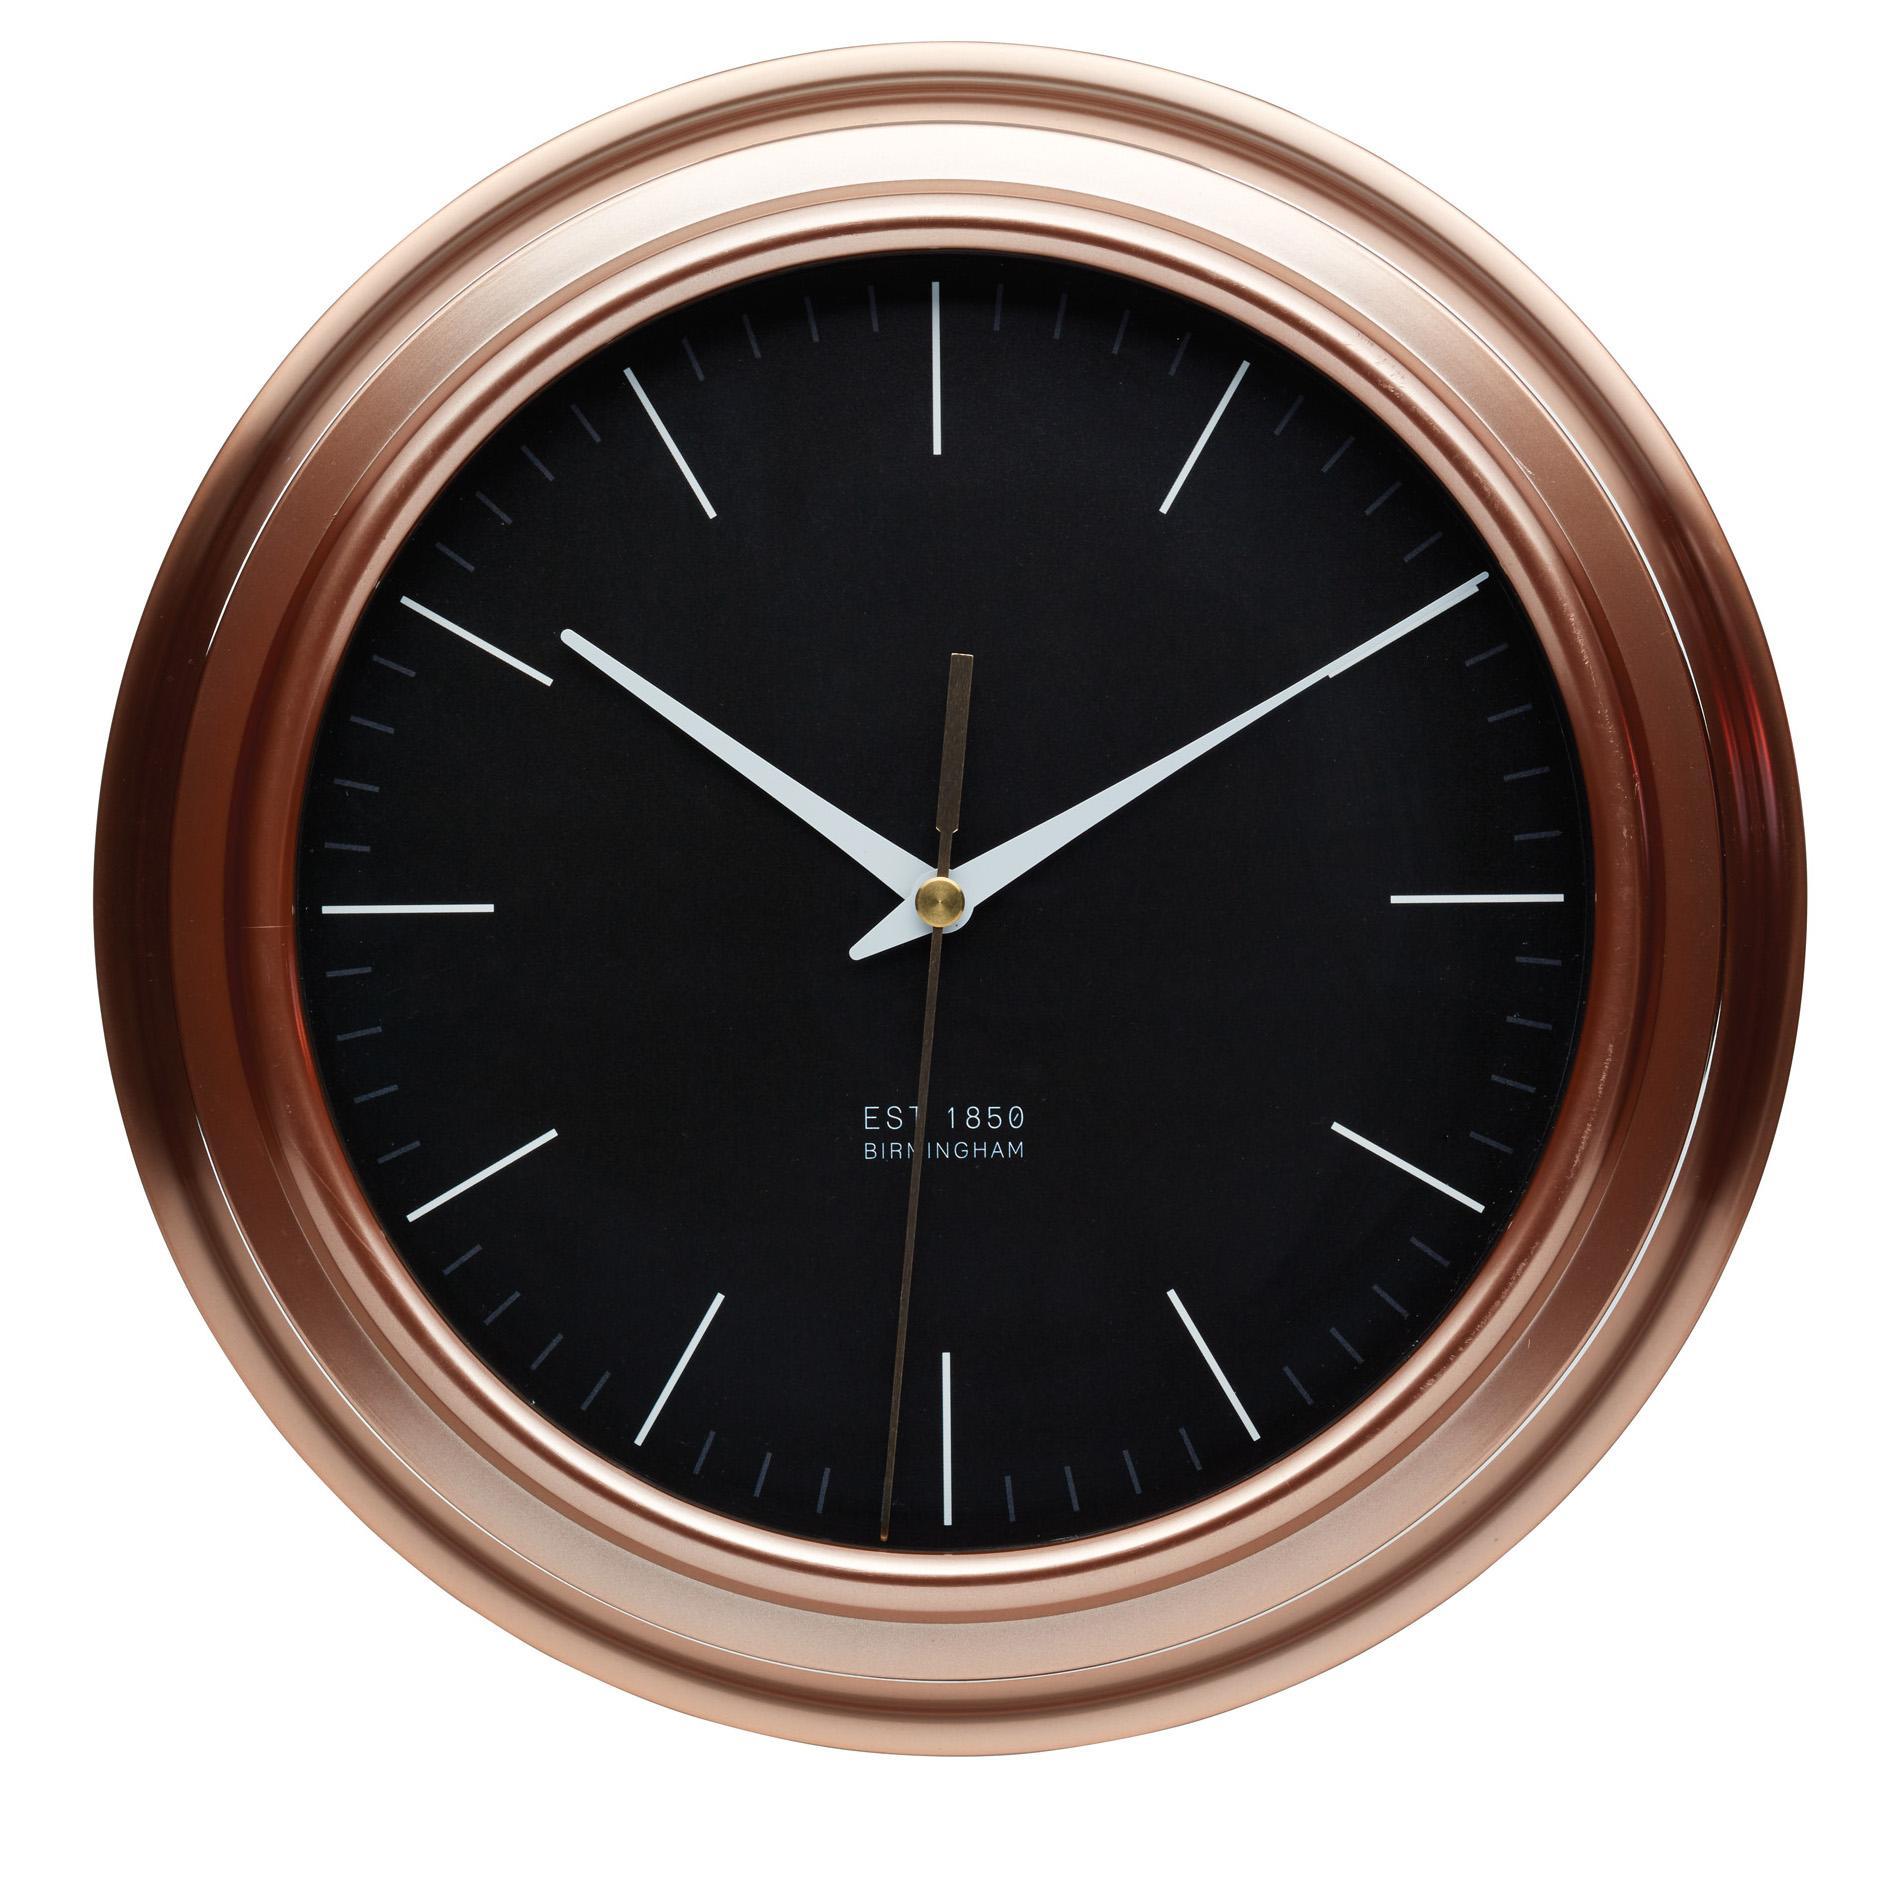 kitchencraft round copper effect kitchen wall clock 25 5. Black Bedroom Furniture Sets. Home Design Ideas